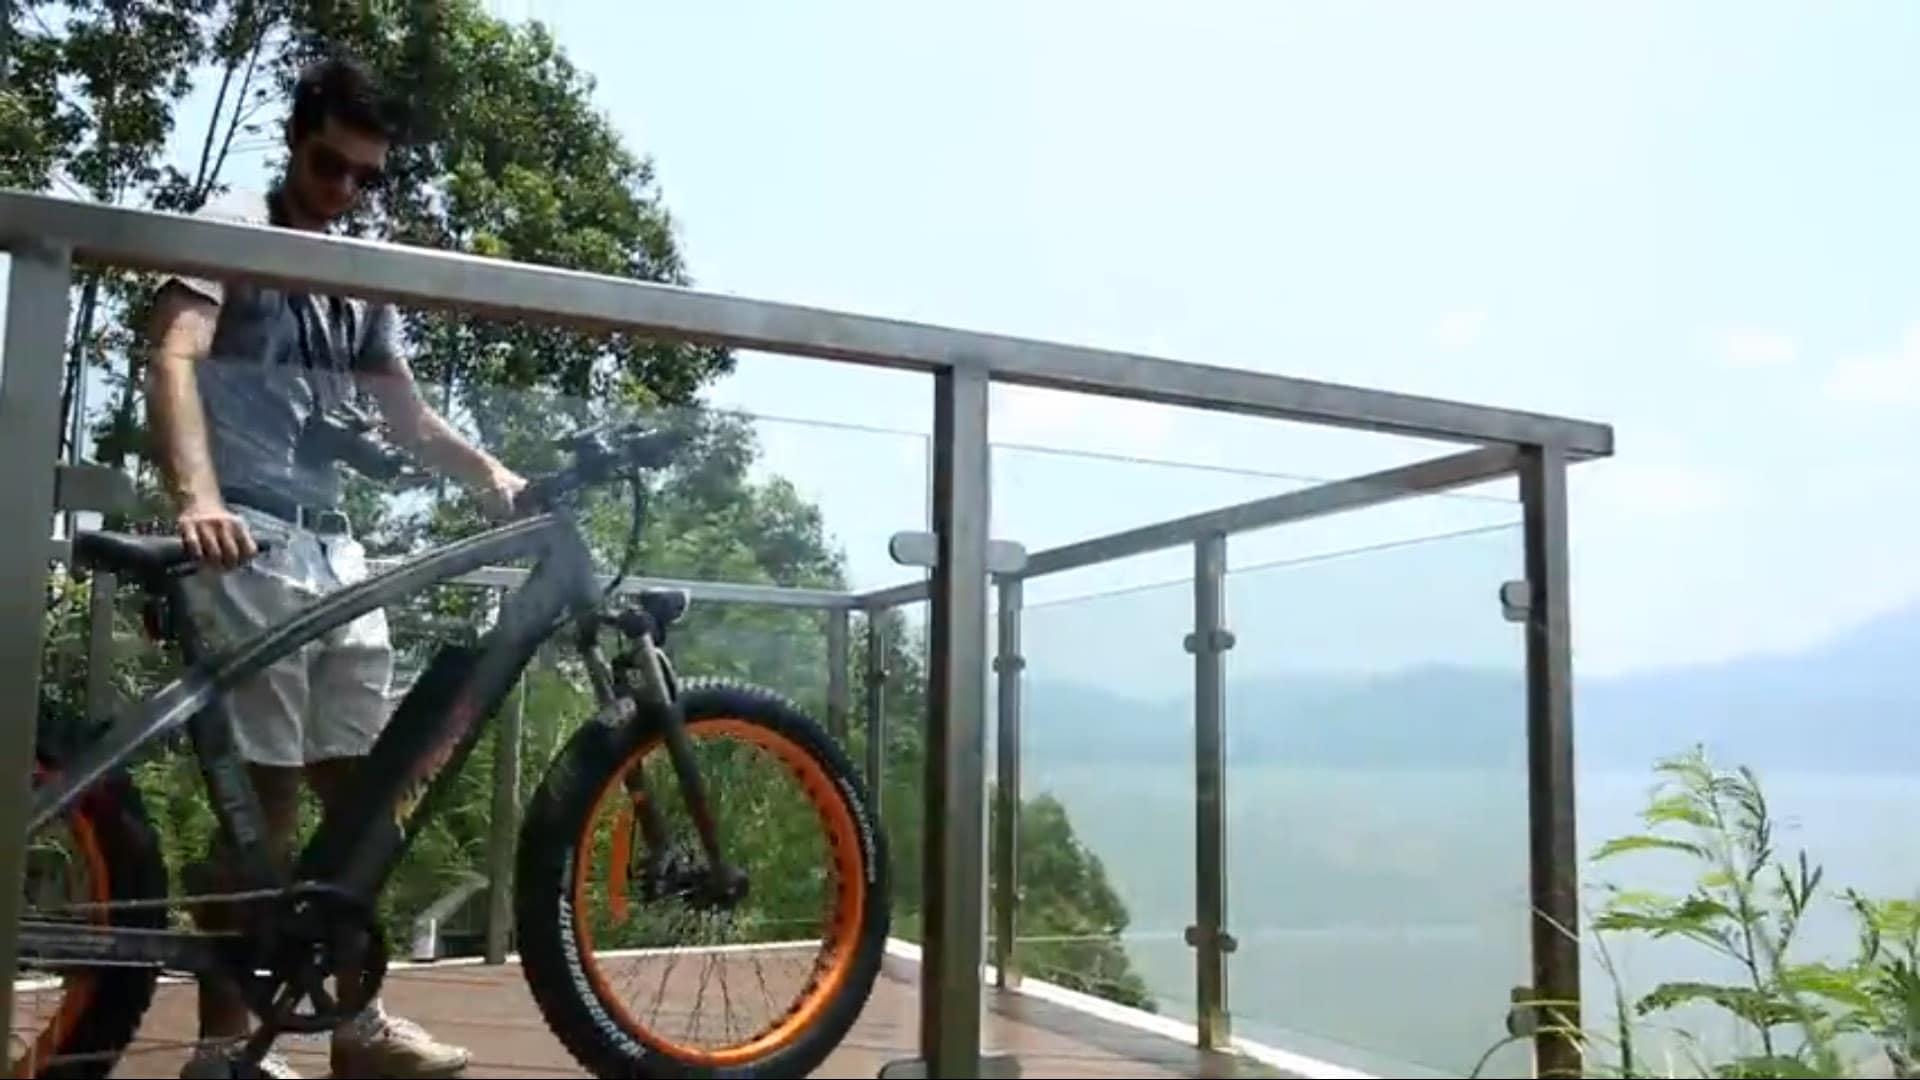 Man holding the fat tire bike